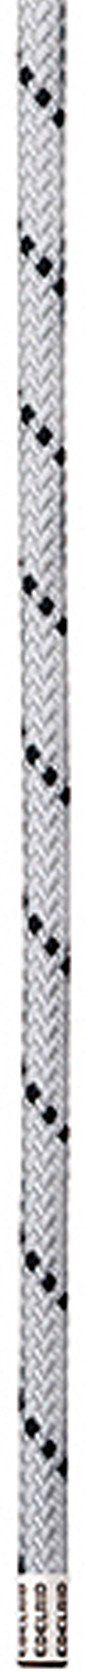 Edelrid Kletterseil »Performance Static Rope 9,0mm 200m«